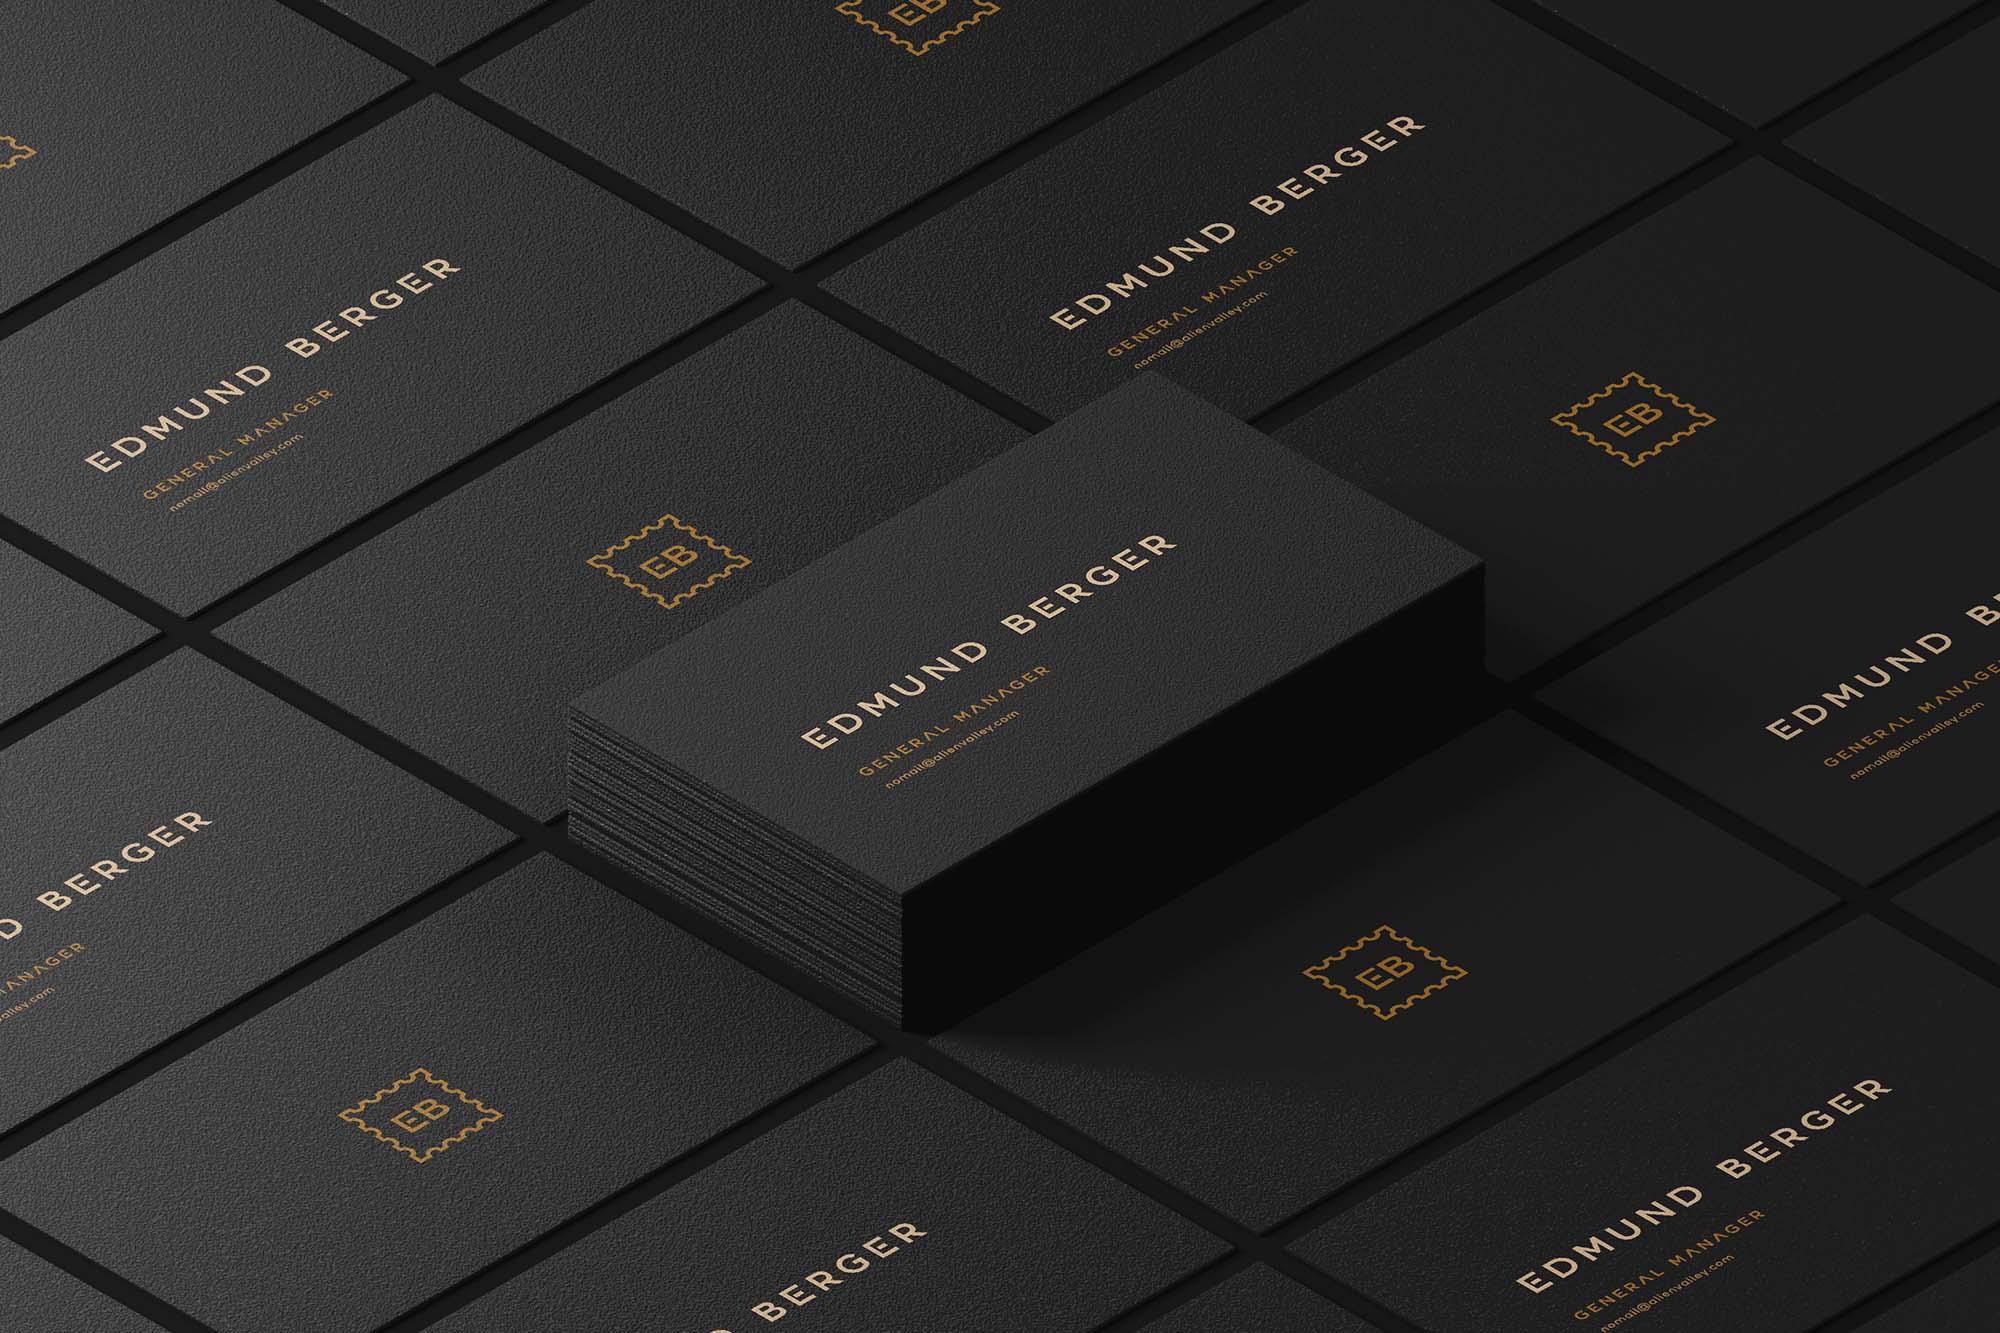 Dark Isometric Business Cards Mockup